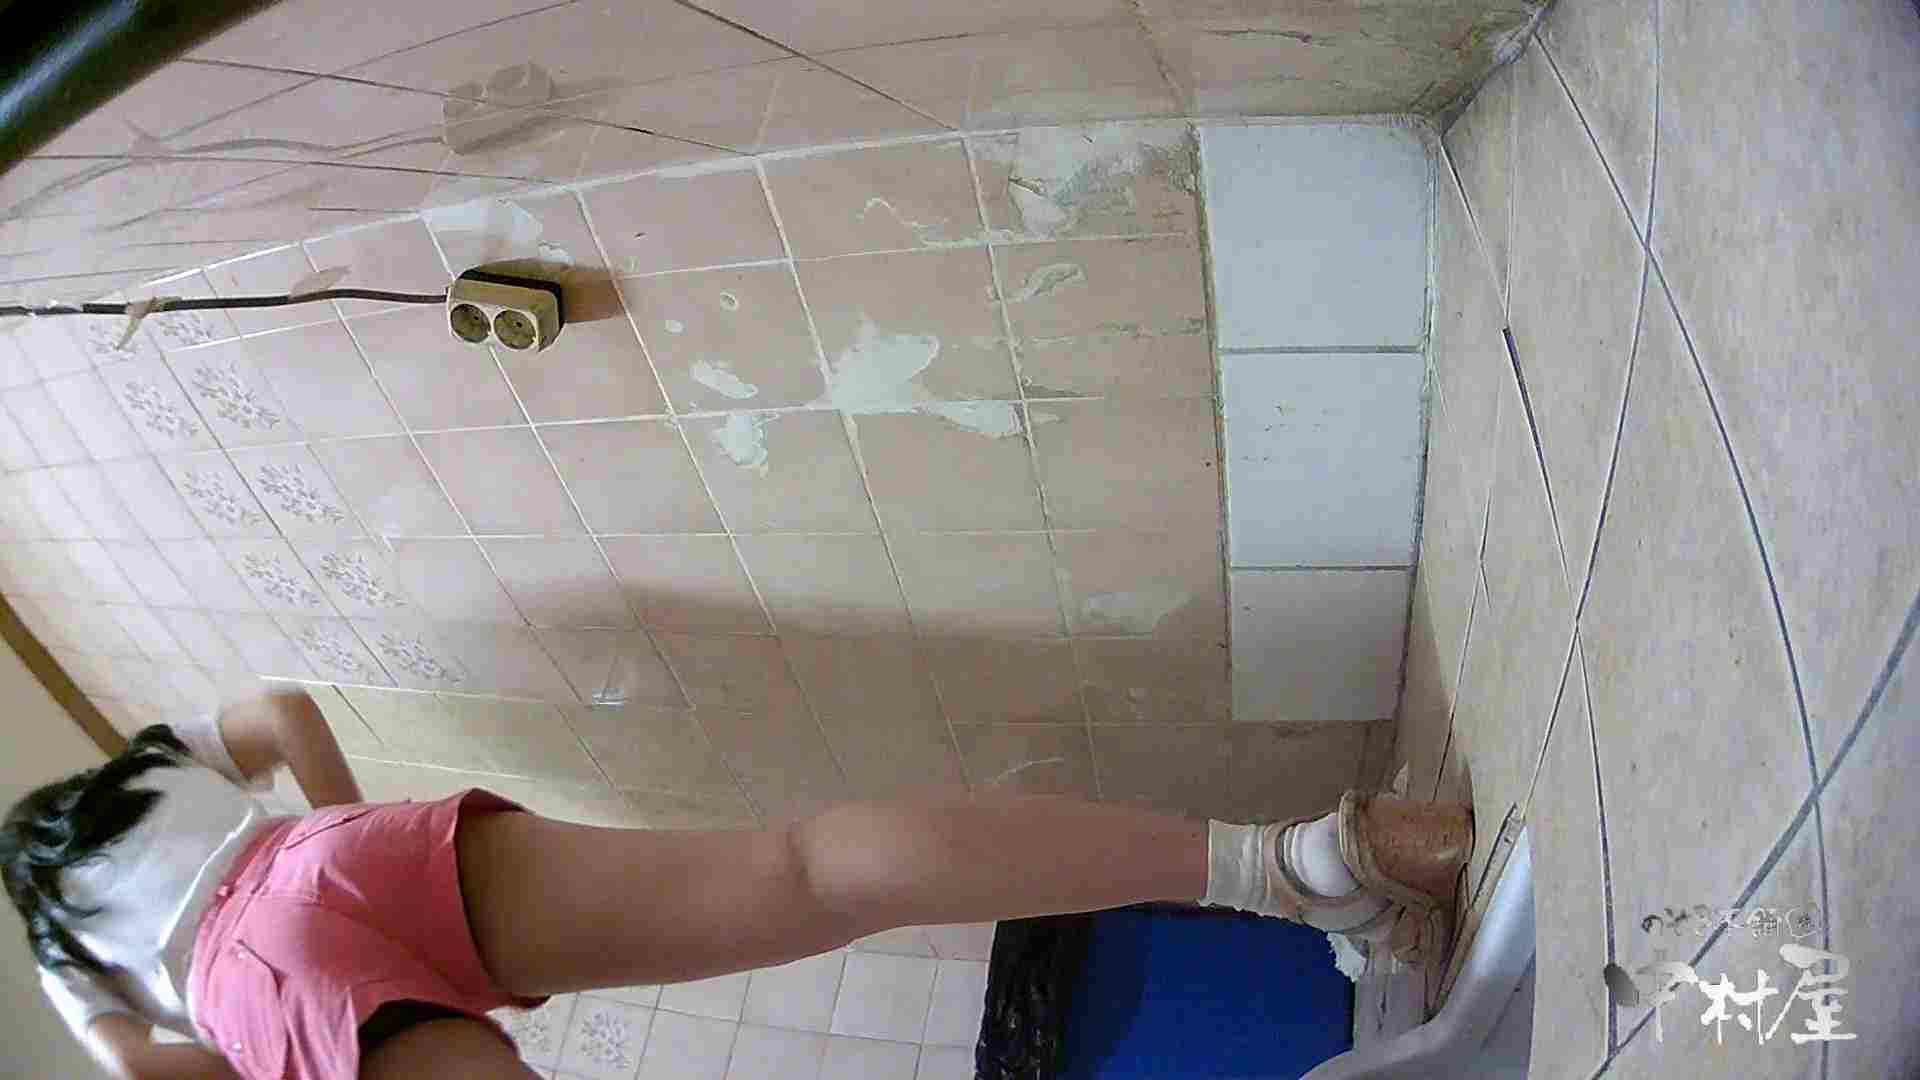 真夜中の情事④ 入浴  31連発 28